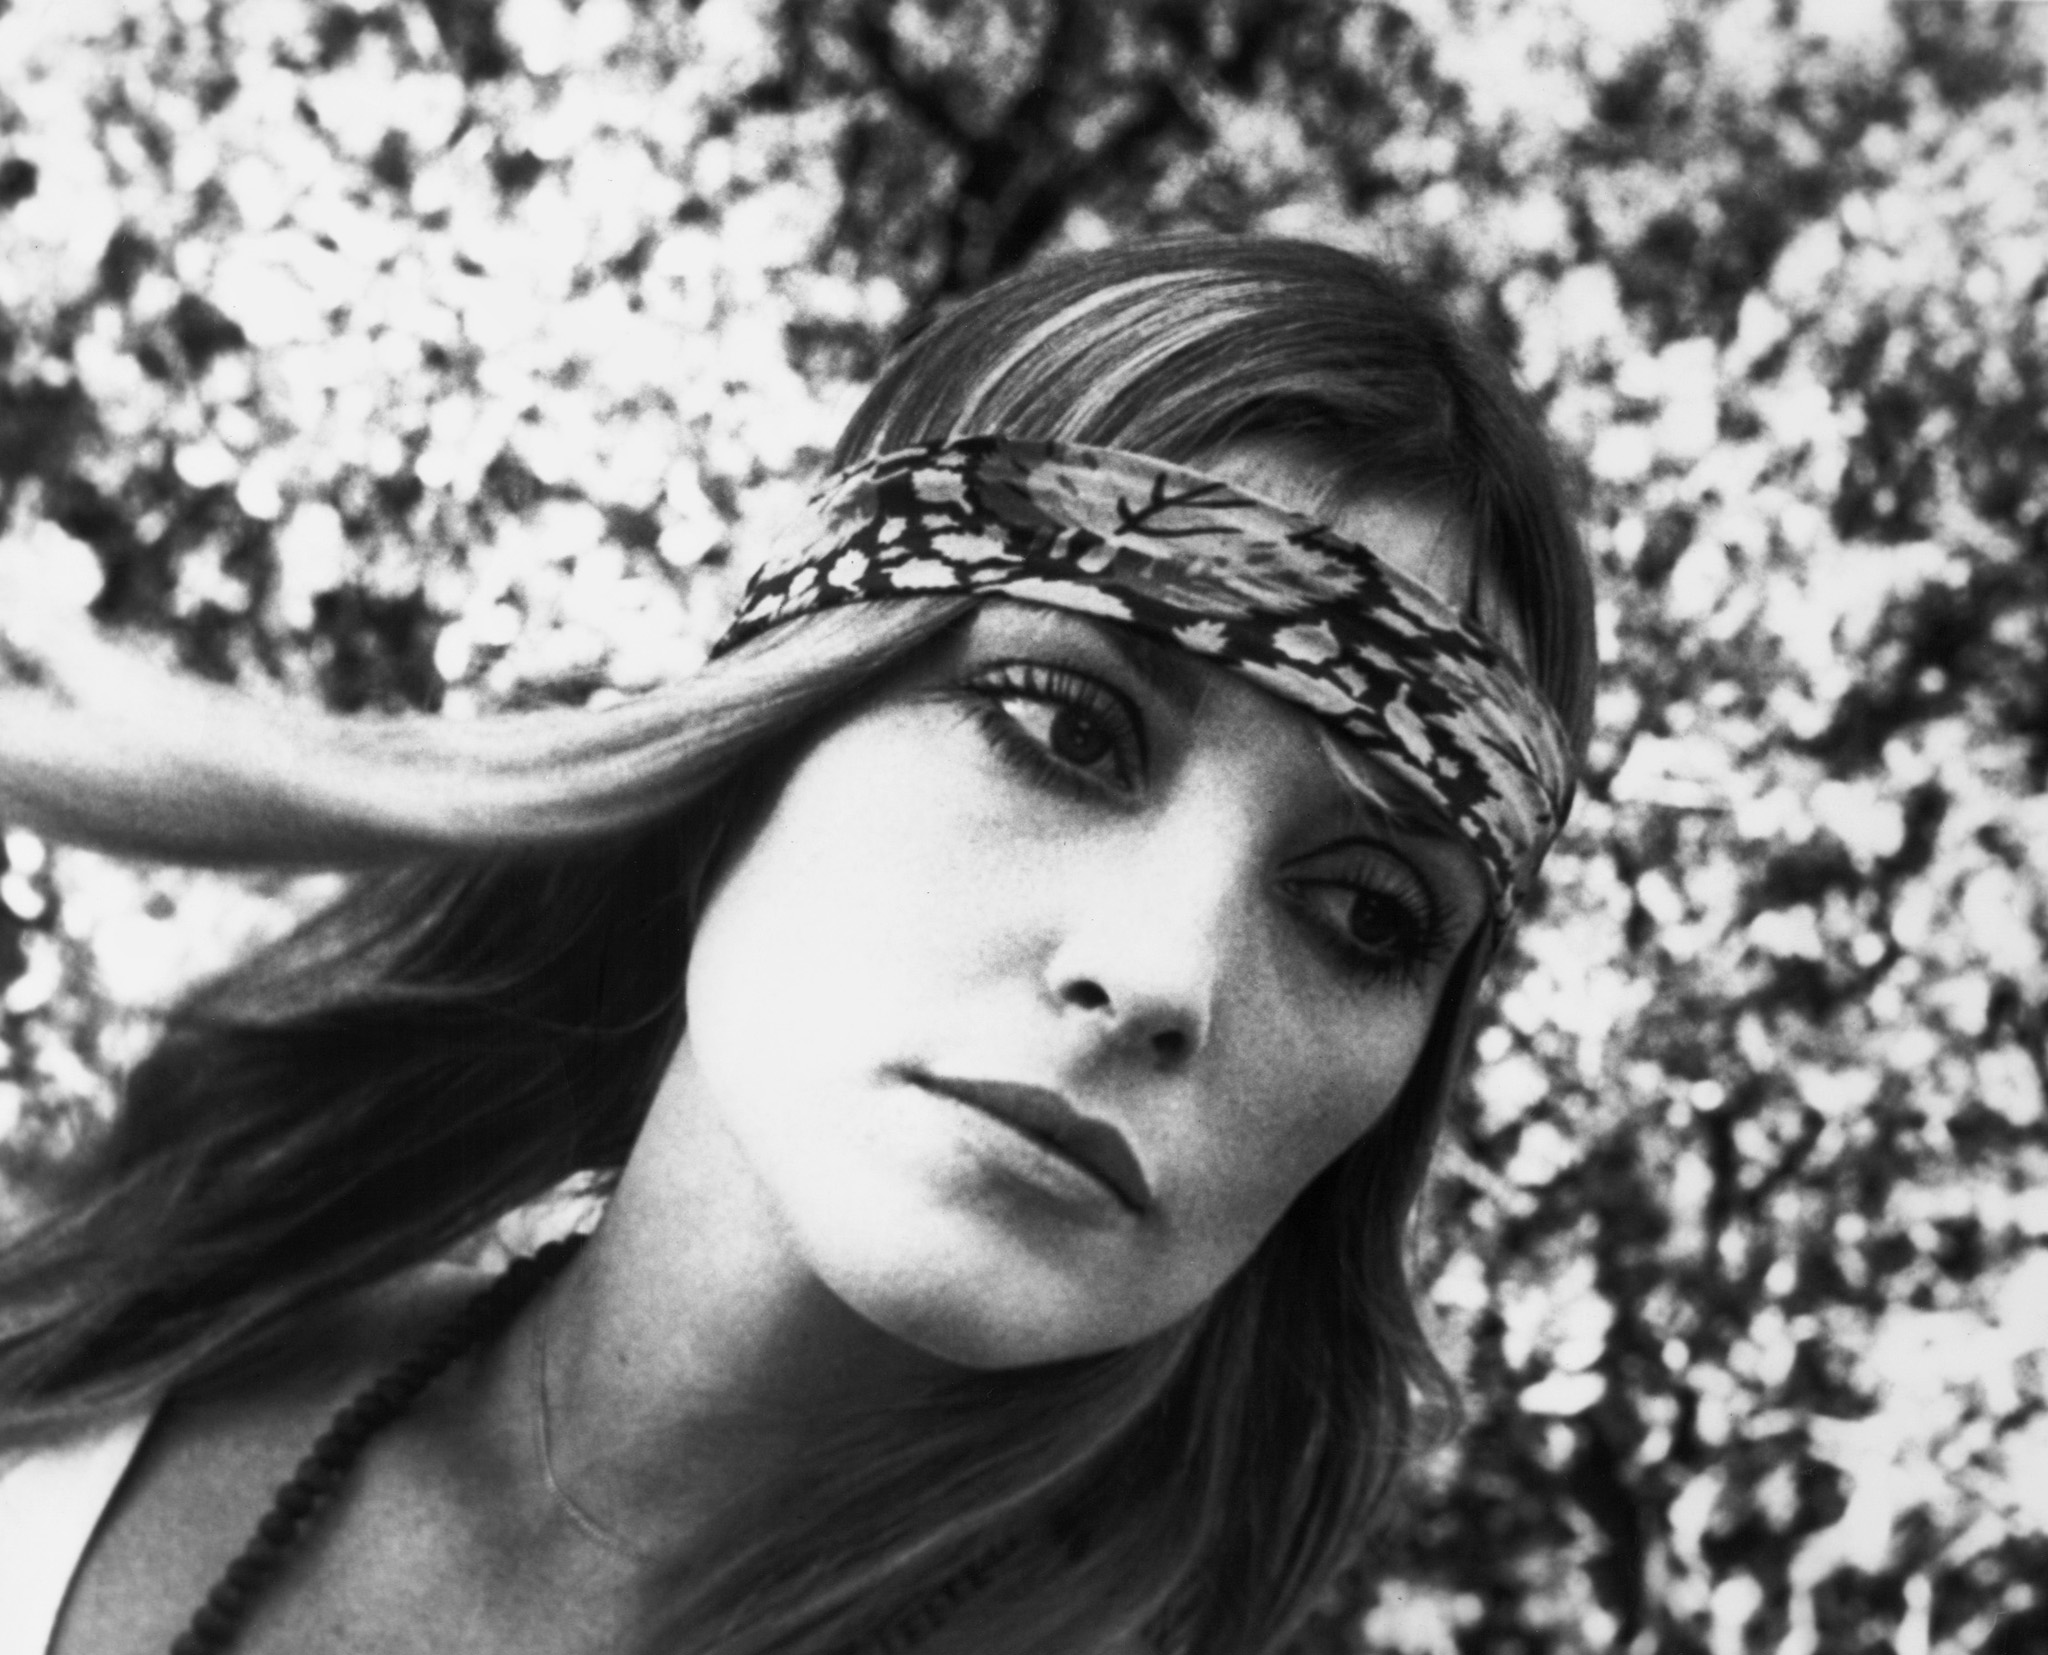 Sharon Tate dead